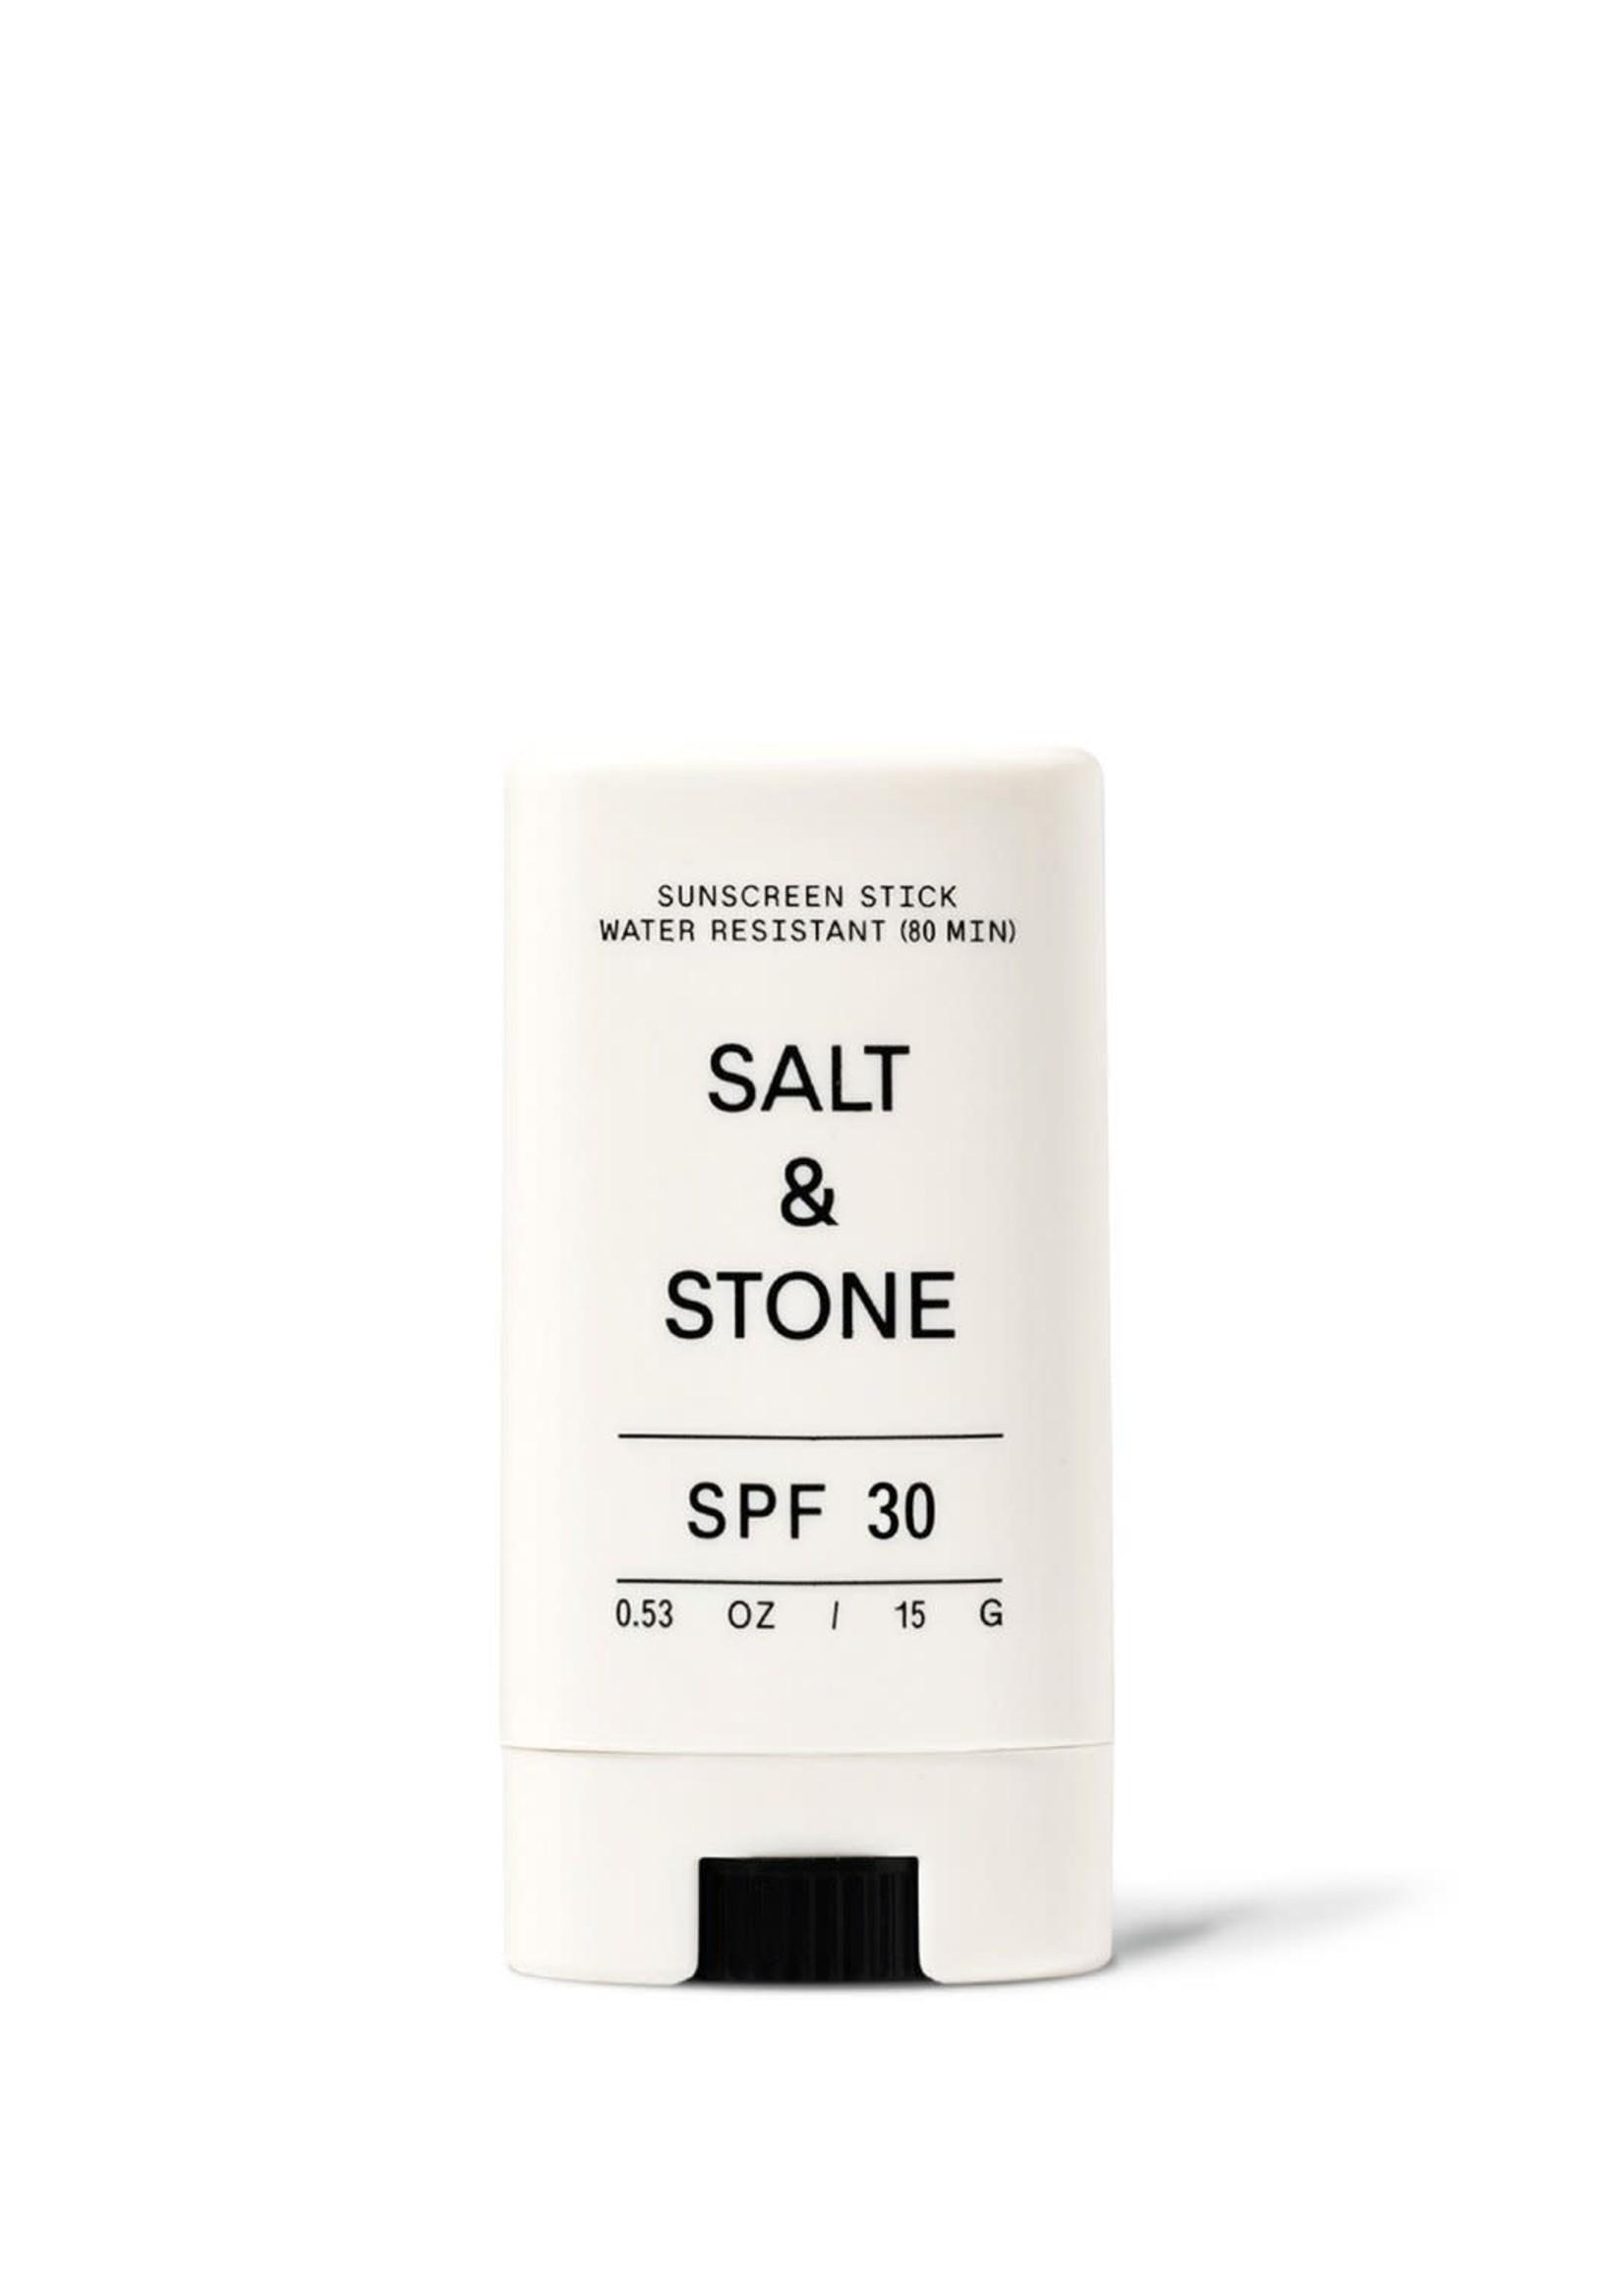 SALT & STONE FACE STICK SPF 30